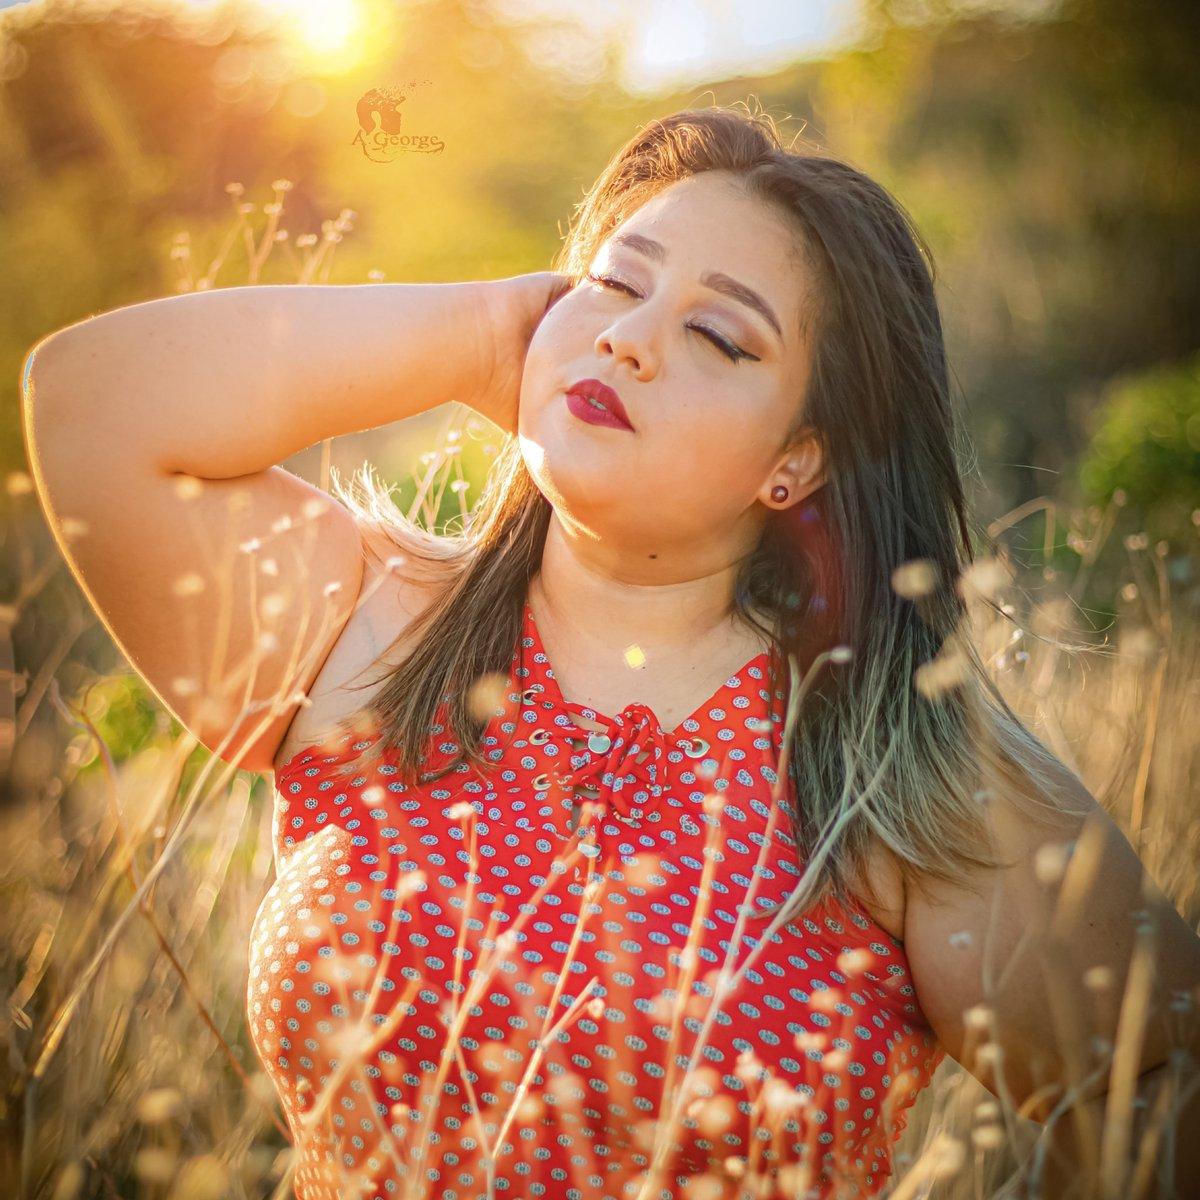 #previa #projetonovo #vemmusicaautoralai #sonhos #priscillaalcantara #whinderssonnunes #mariliamendoncacantora pic.twitter.com/uovWUIan8Z